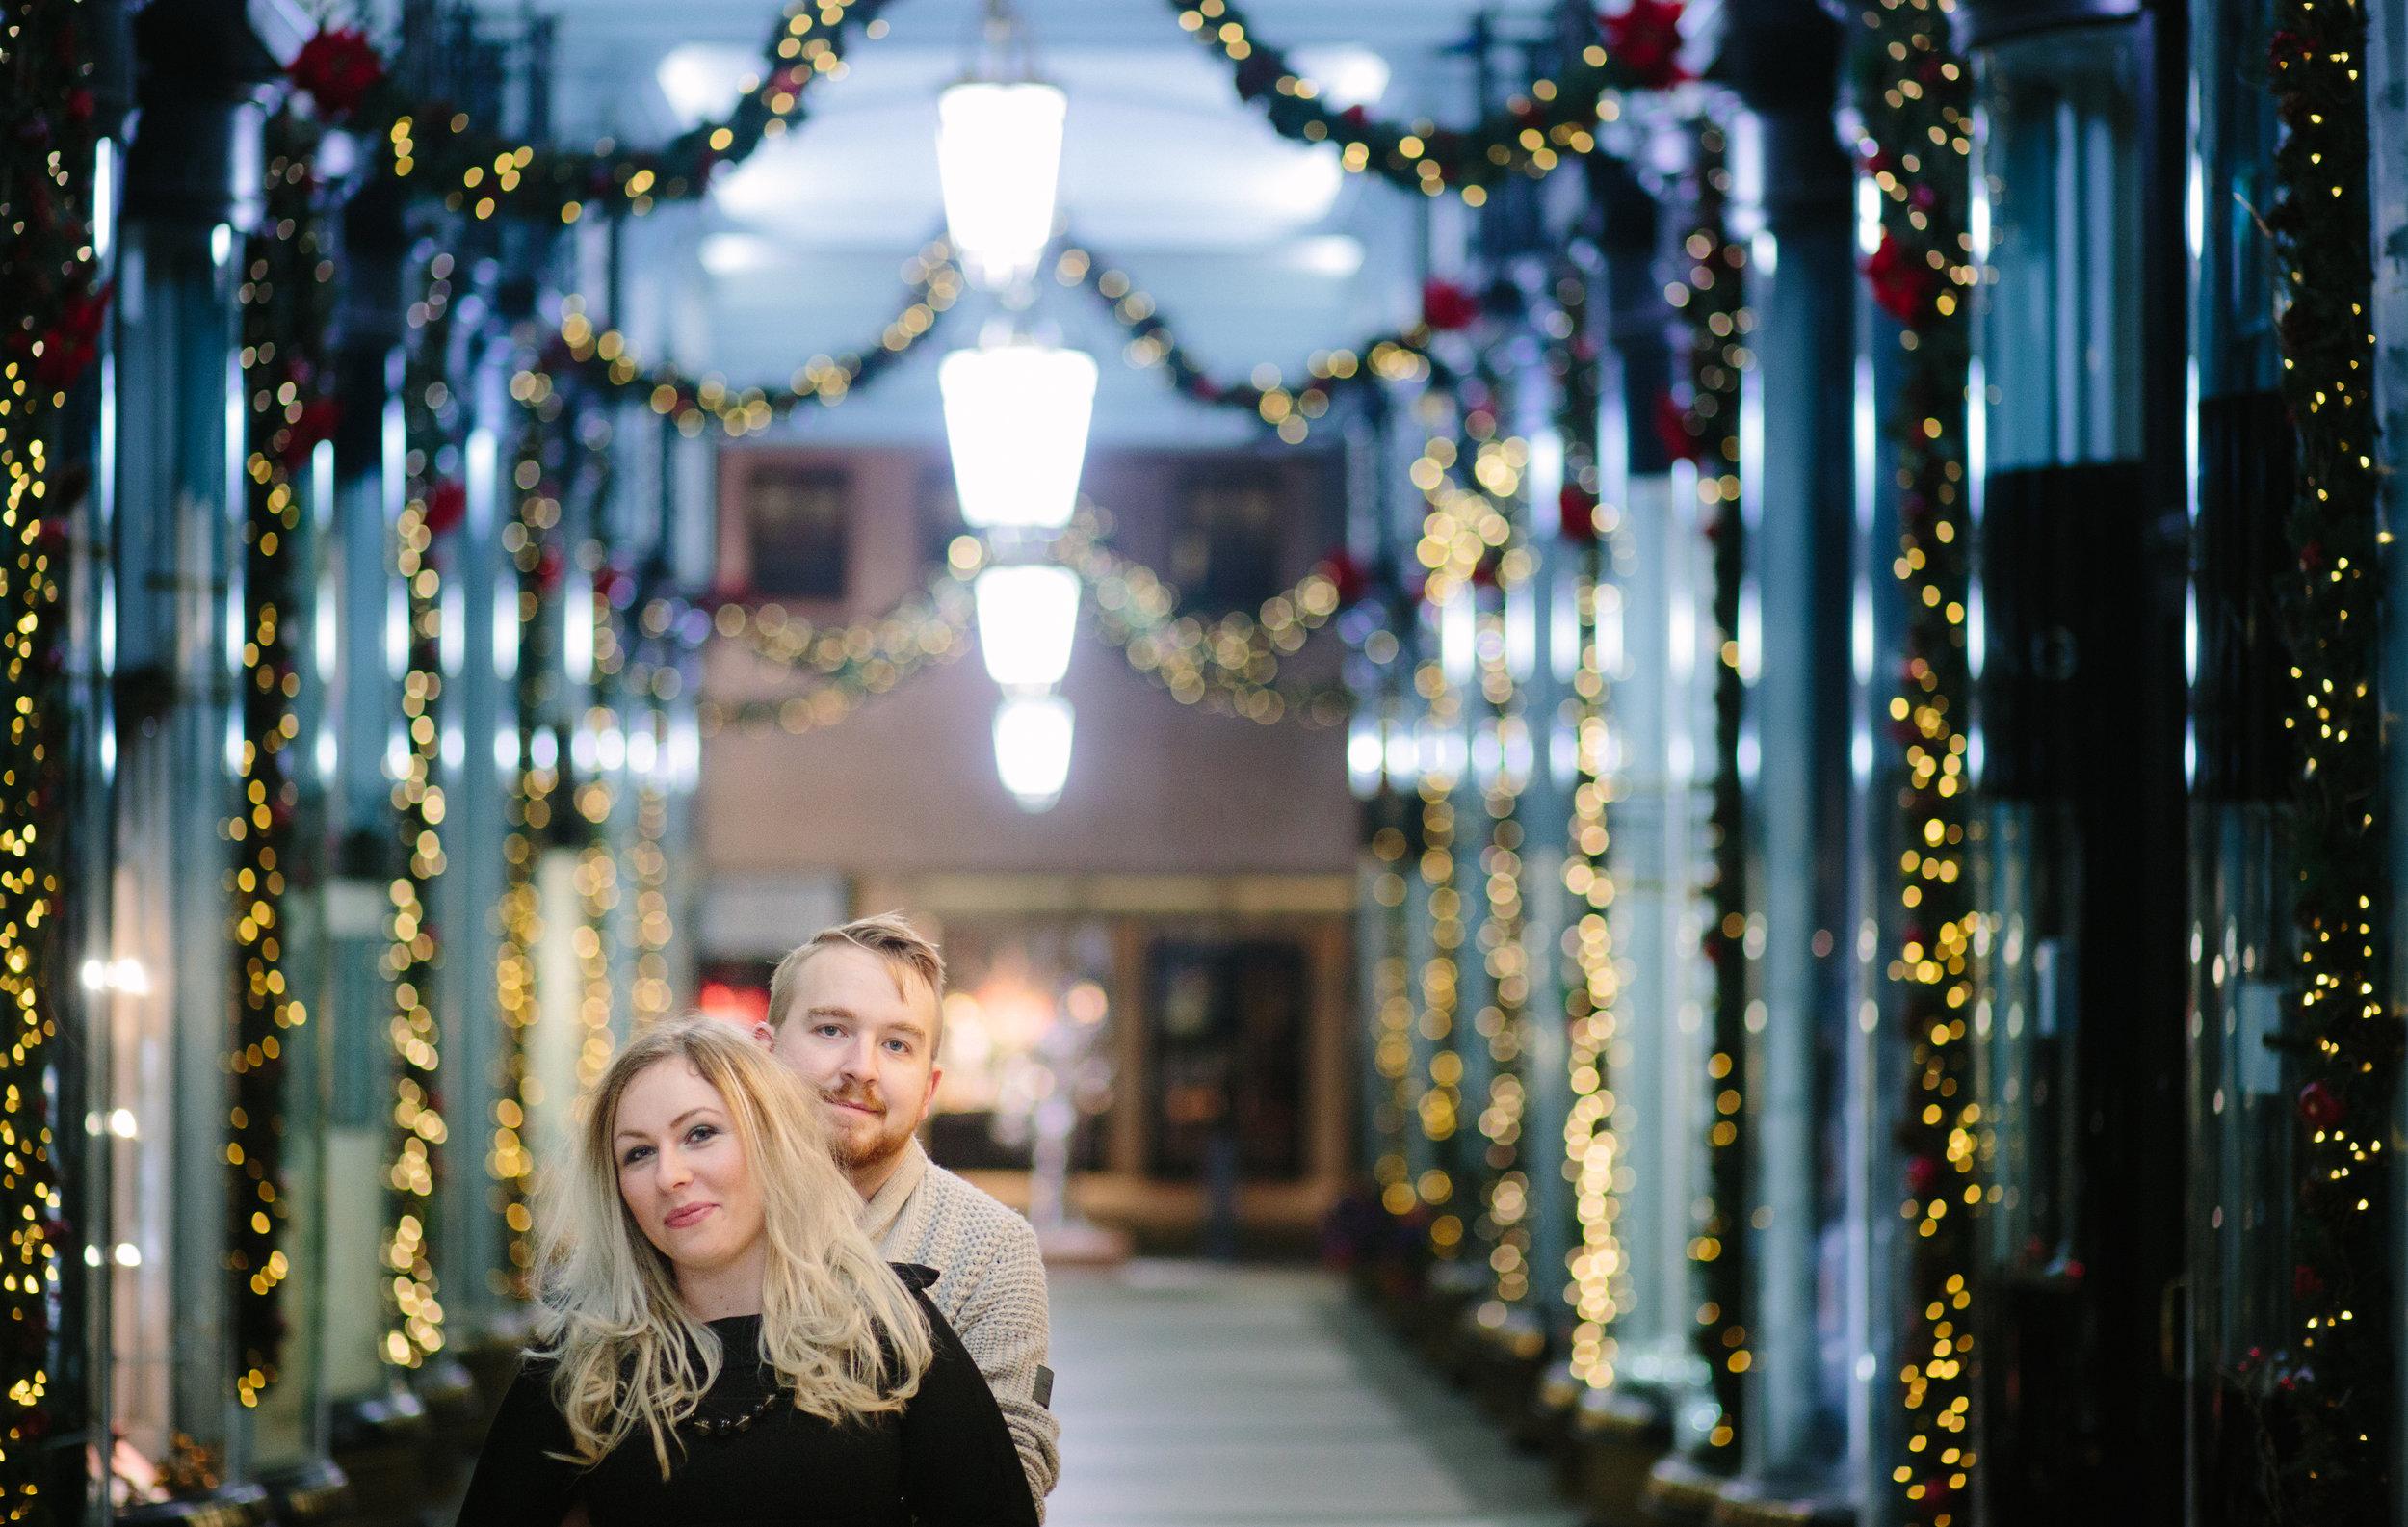 london-oxford-street-christmas-lights-engagement-wedding-photography-07